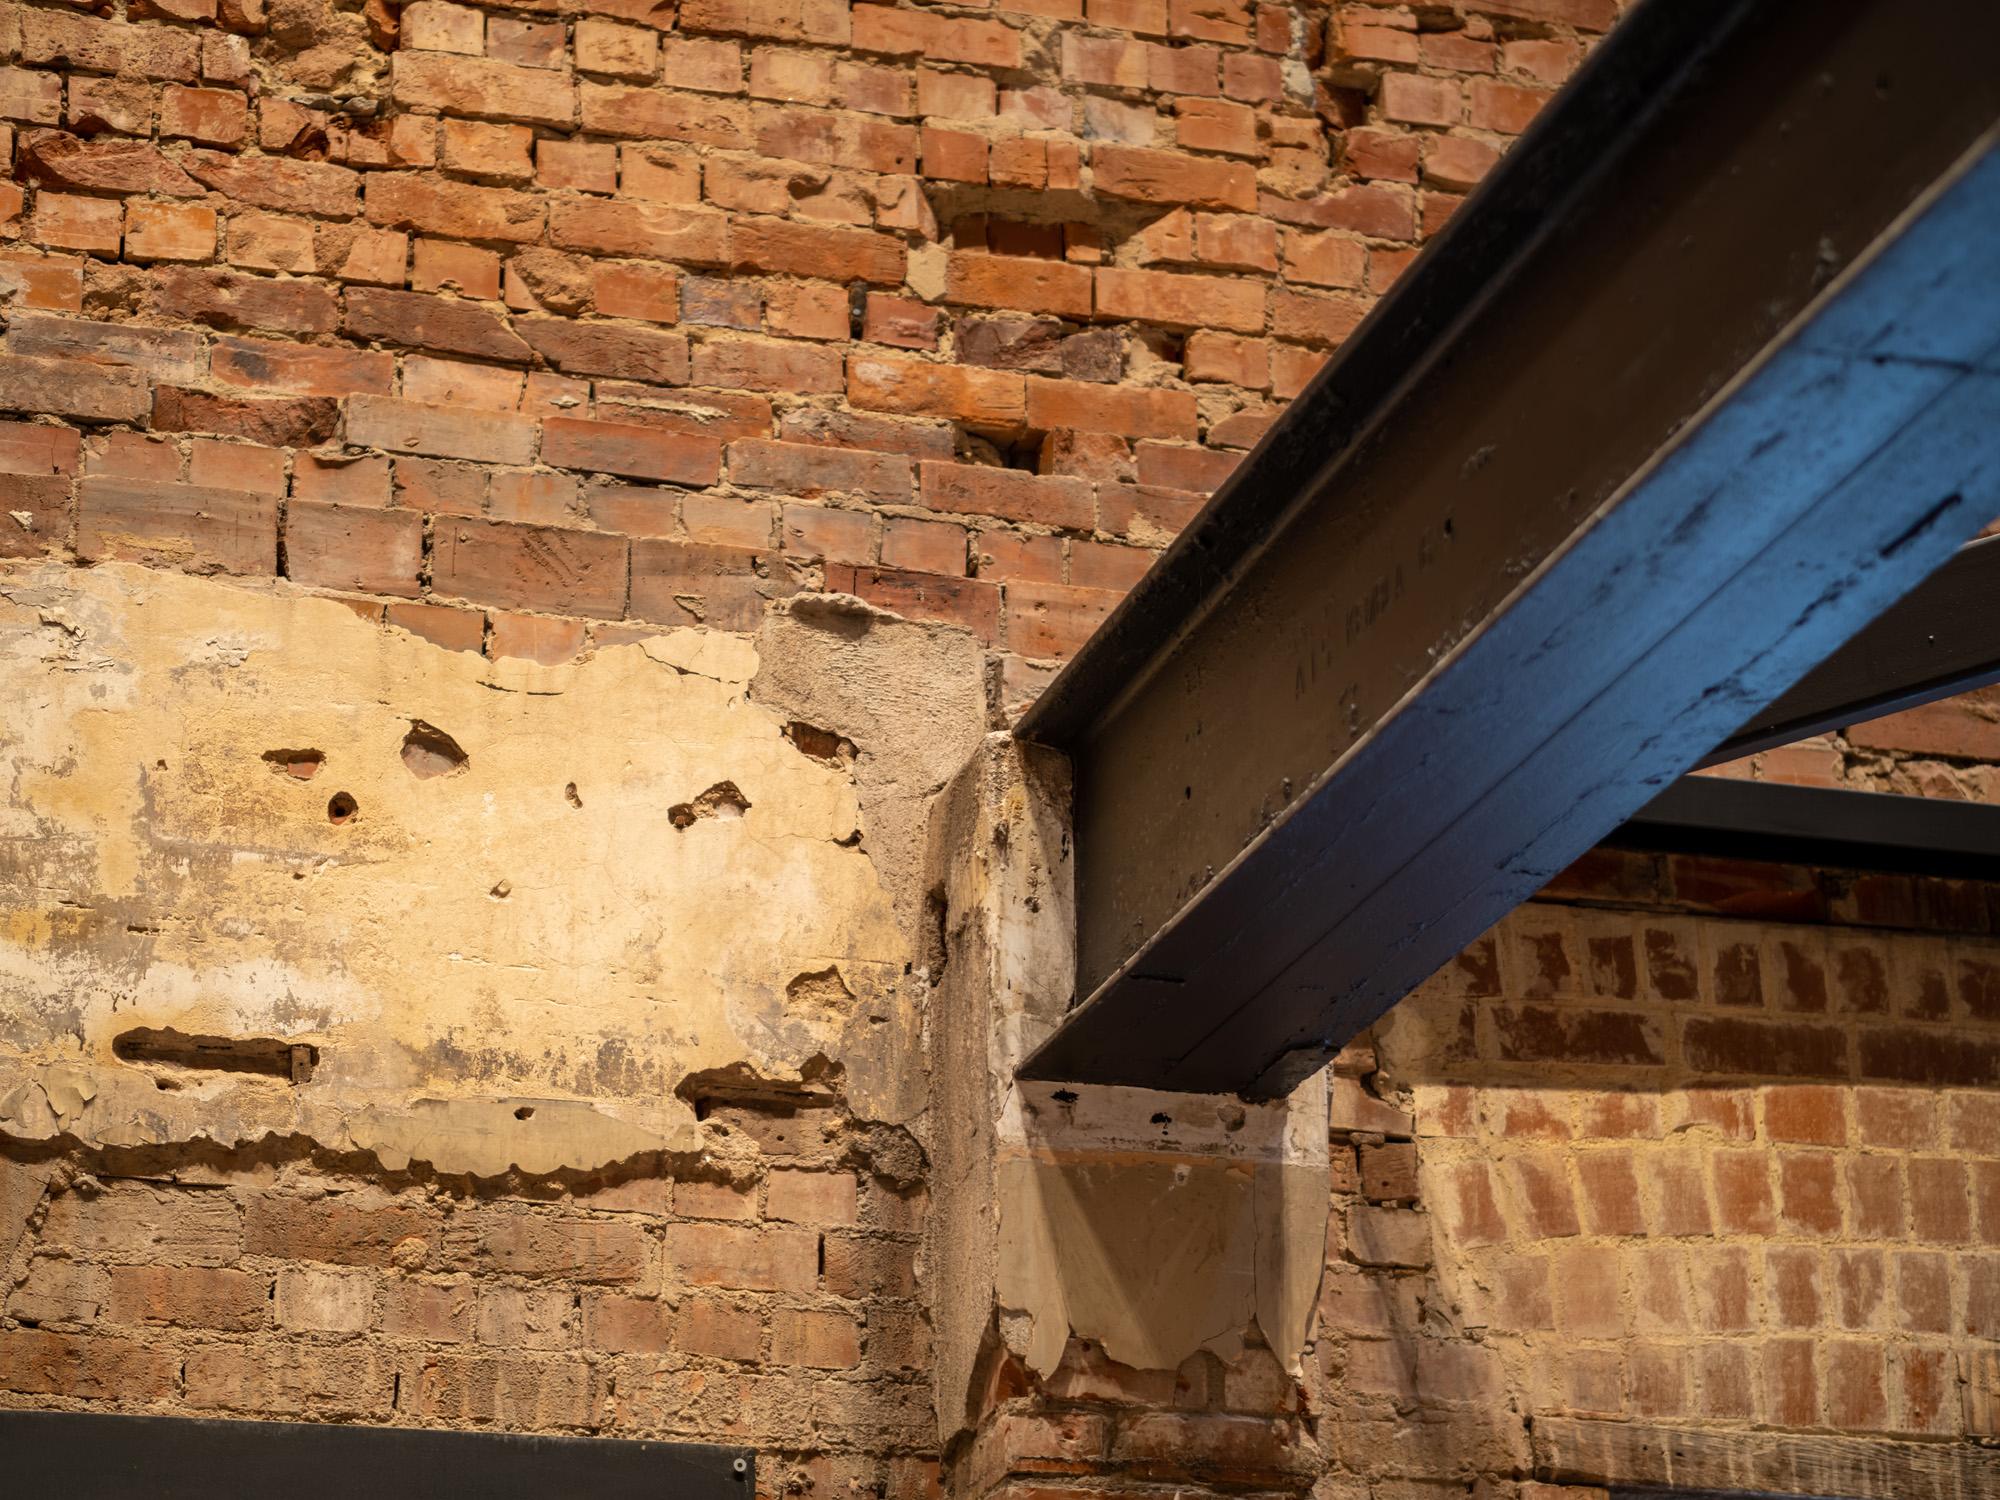 strathmore hotel adelaide exposed brick steel beam